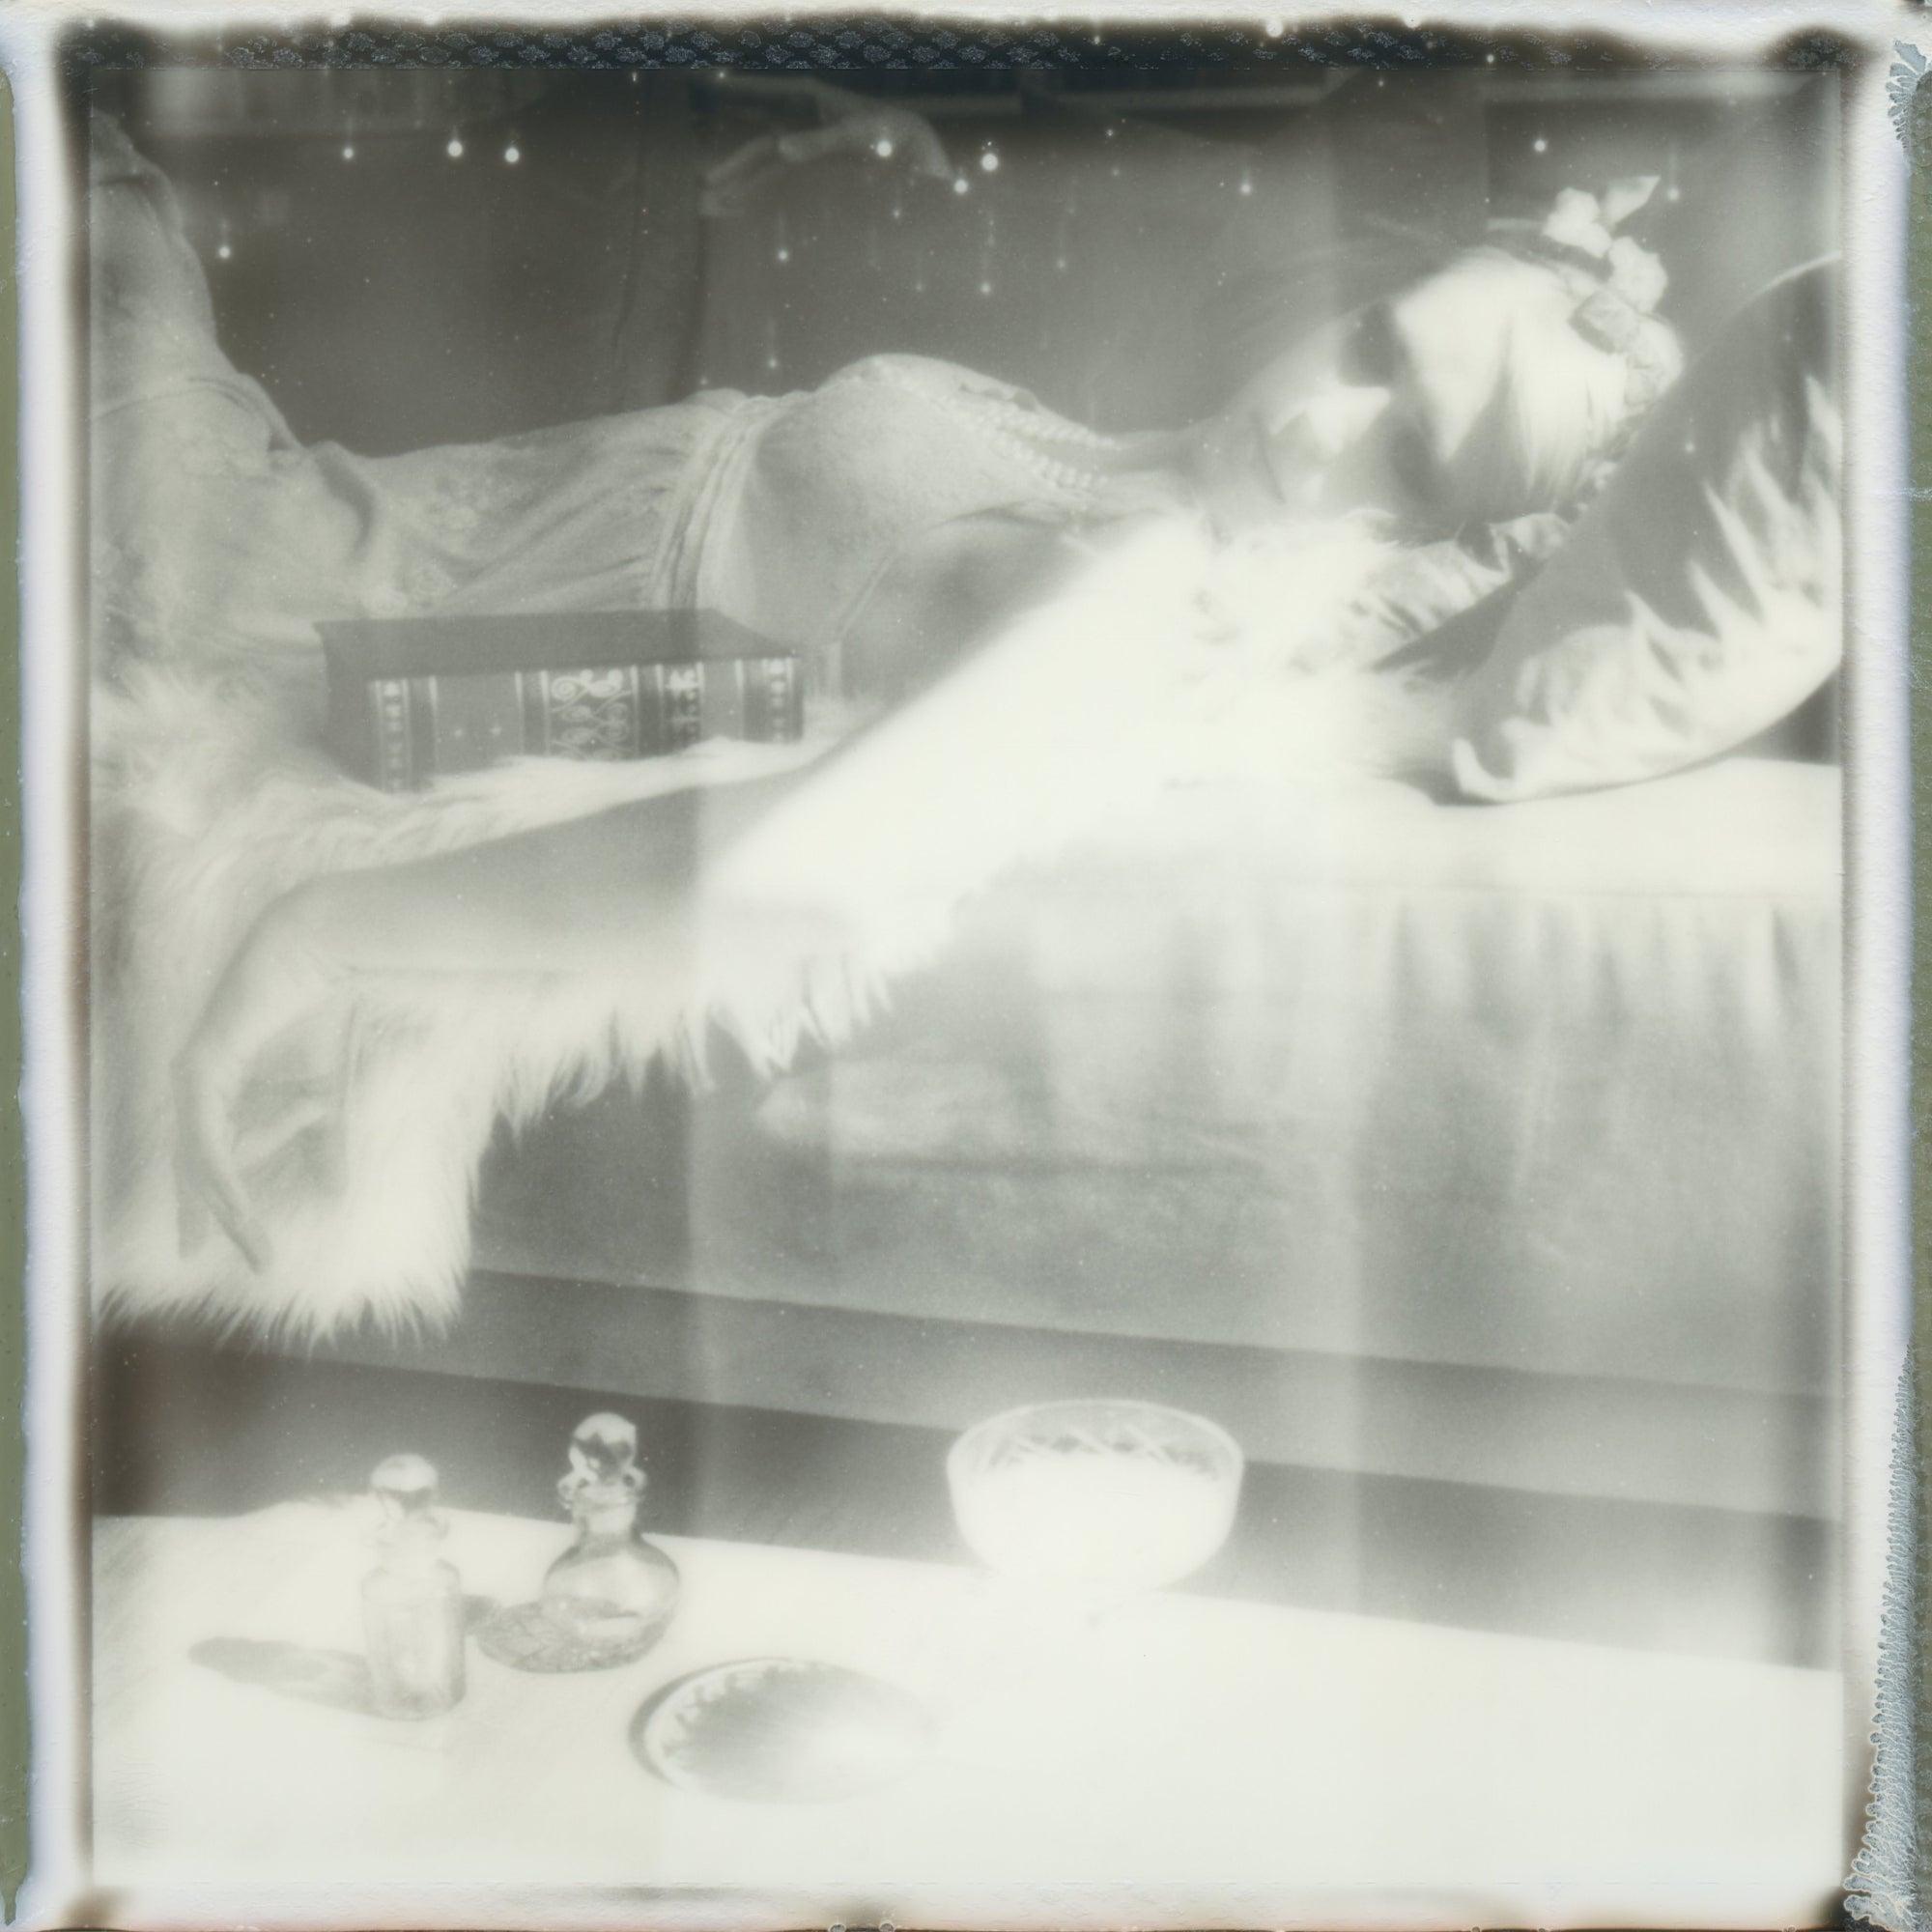 Décadence, 21st Century, Polaroid, Figurative Photography, Contemporary